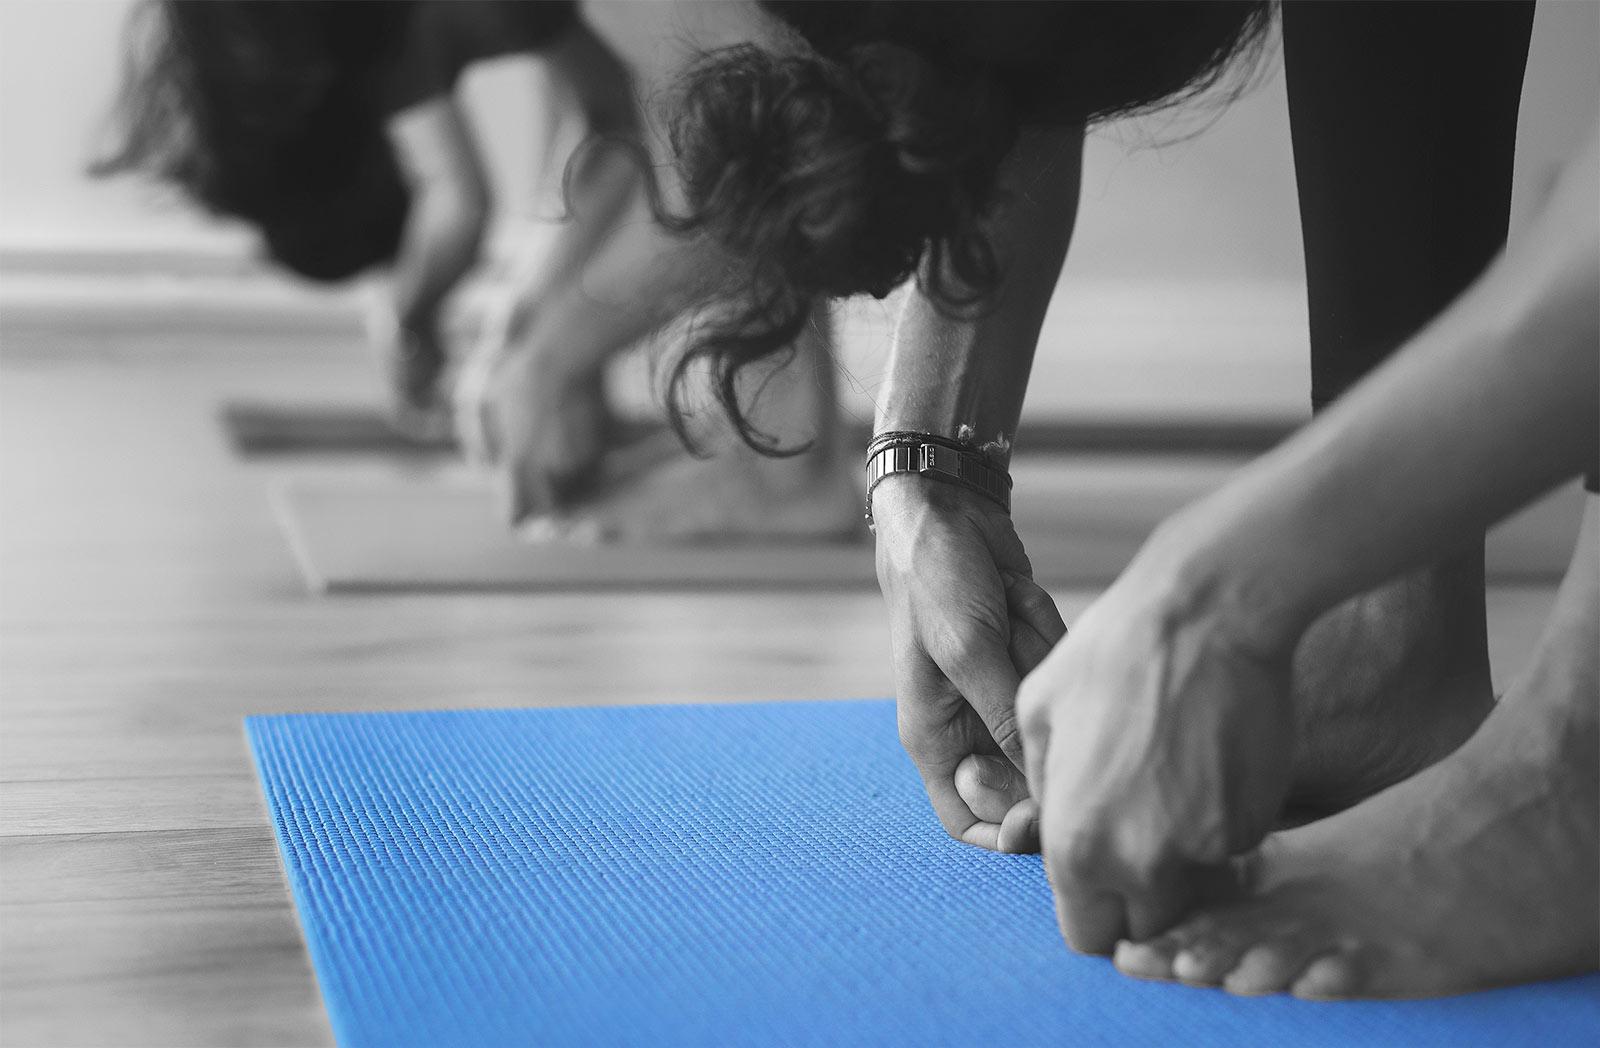 Cours de yoga, tapis bleu